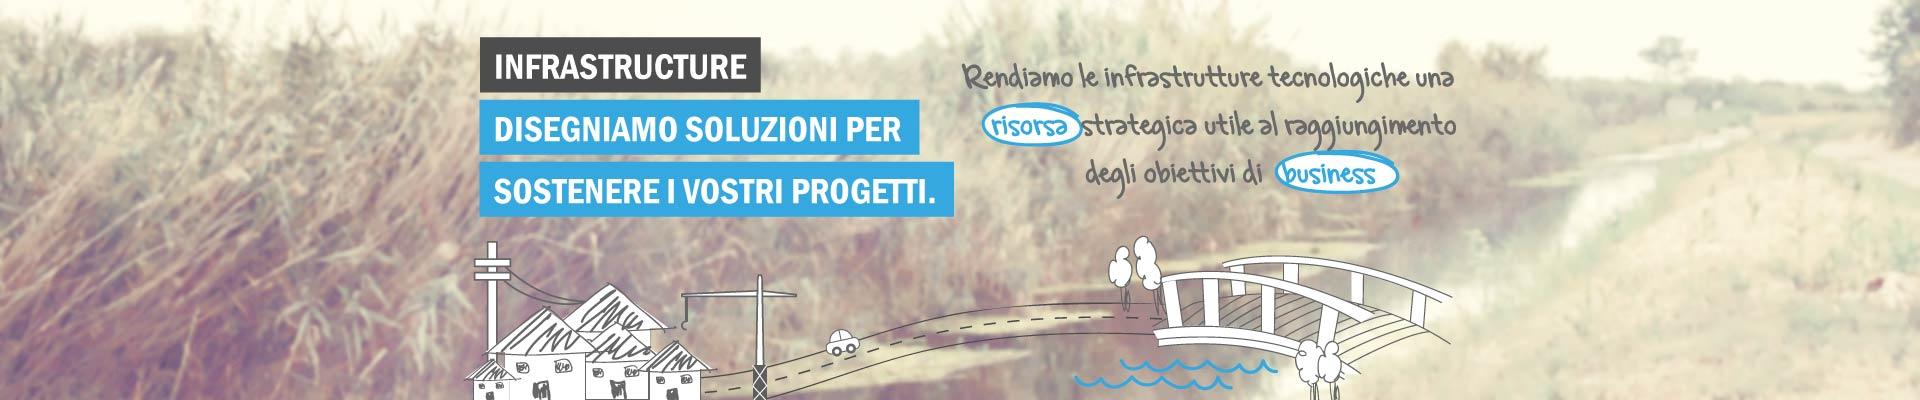 slide_infrastrutture_45percento_CORRETTA